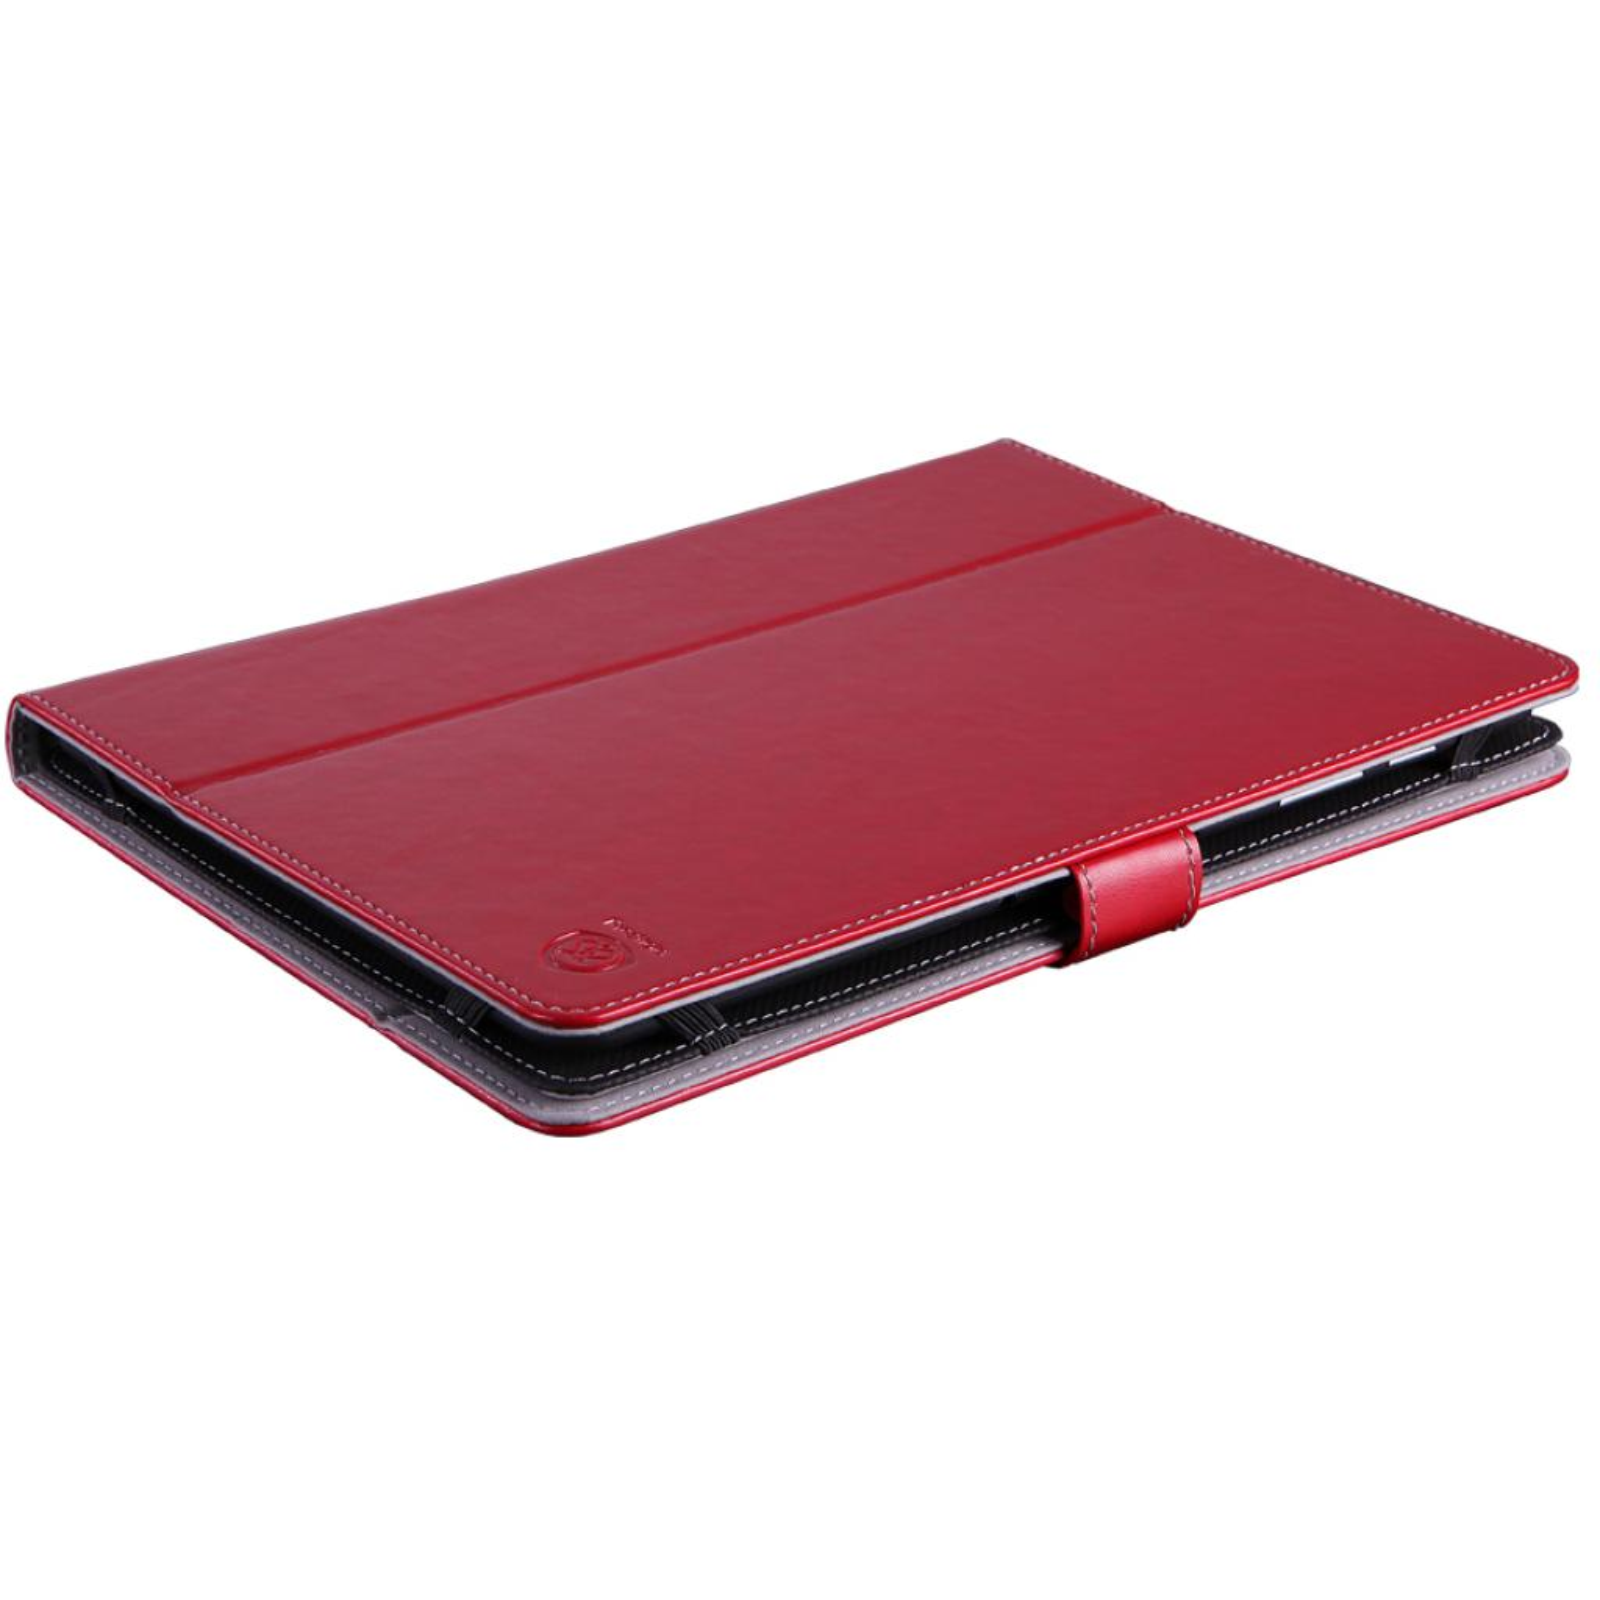 "Чехол для планшета PRESTIGIO 10.1"" Universal rotating RED (PTCL0210RD) изображение 3"